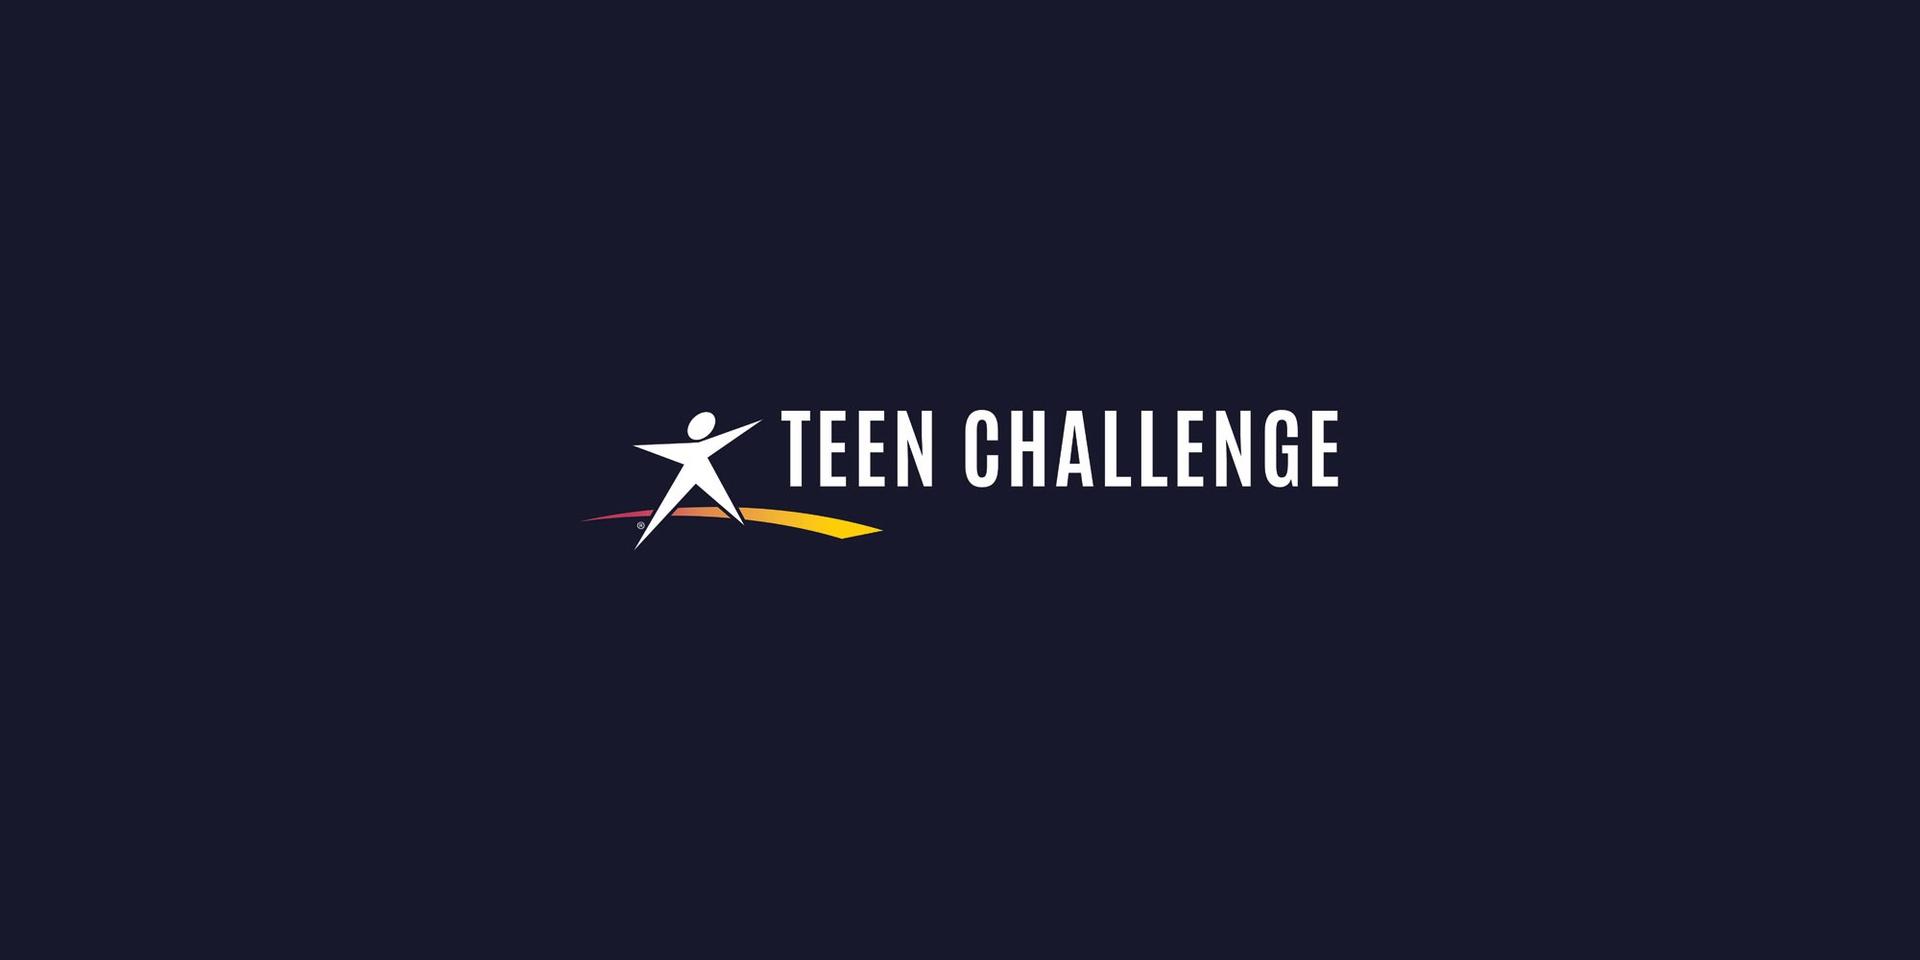 Oklahoma teen challenge